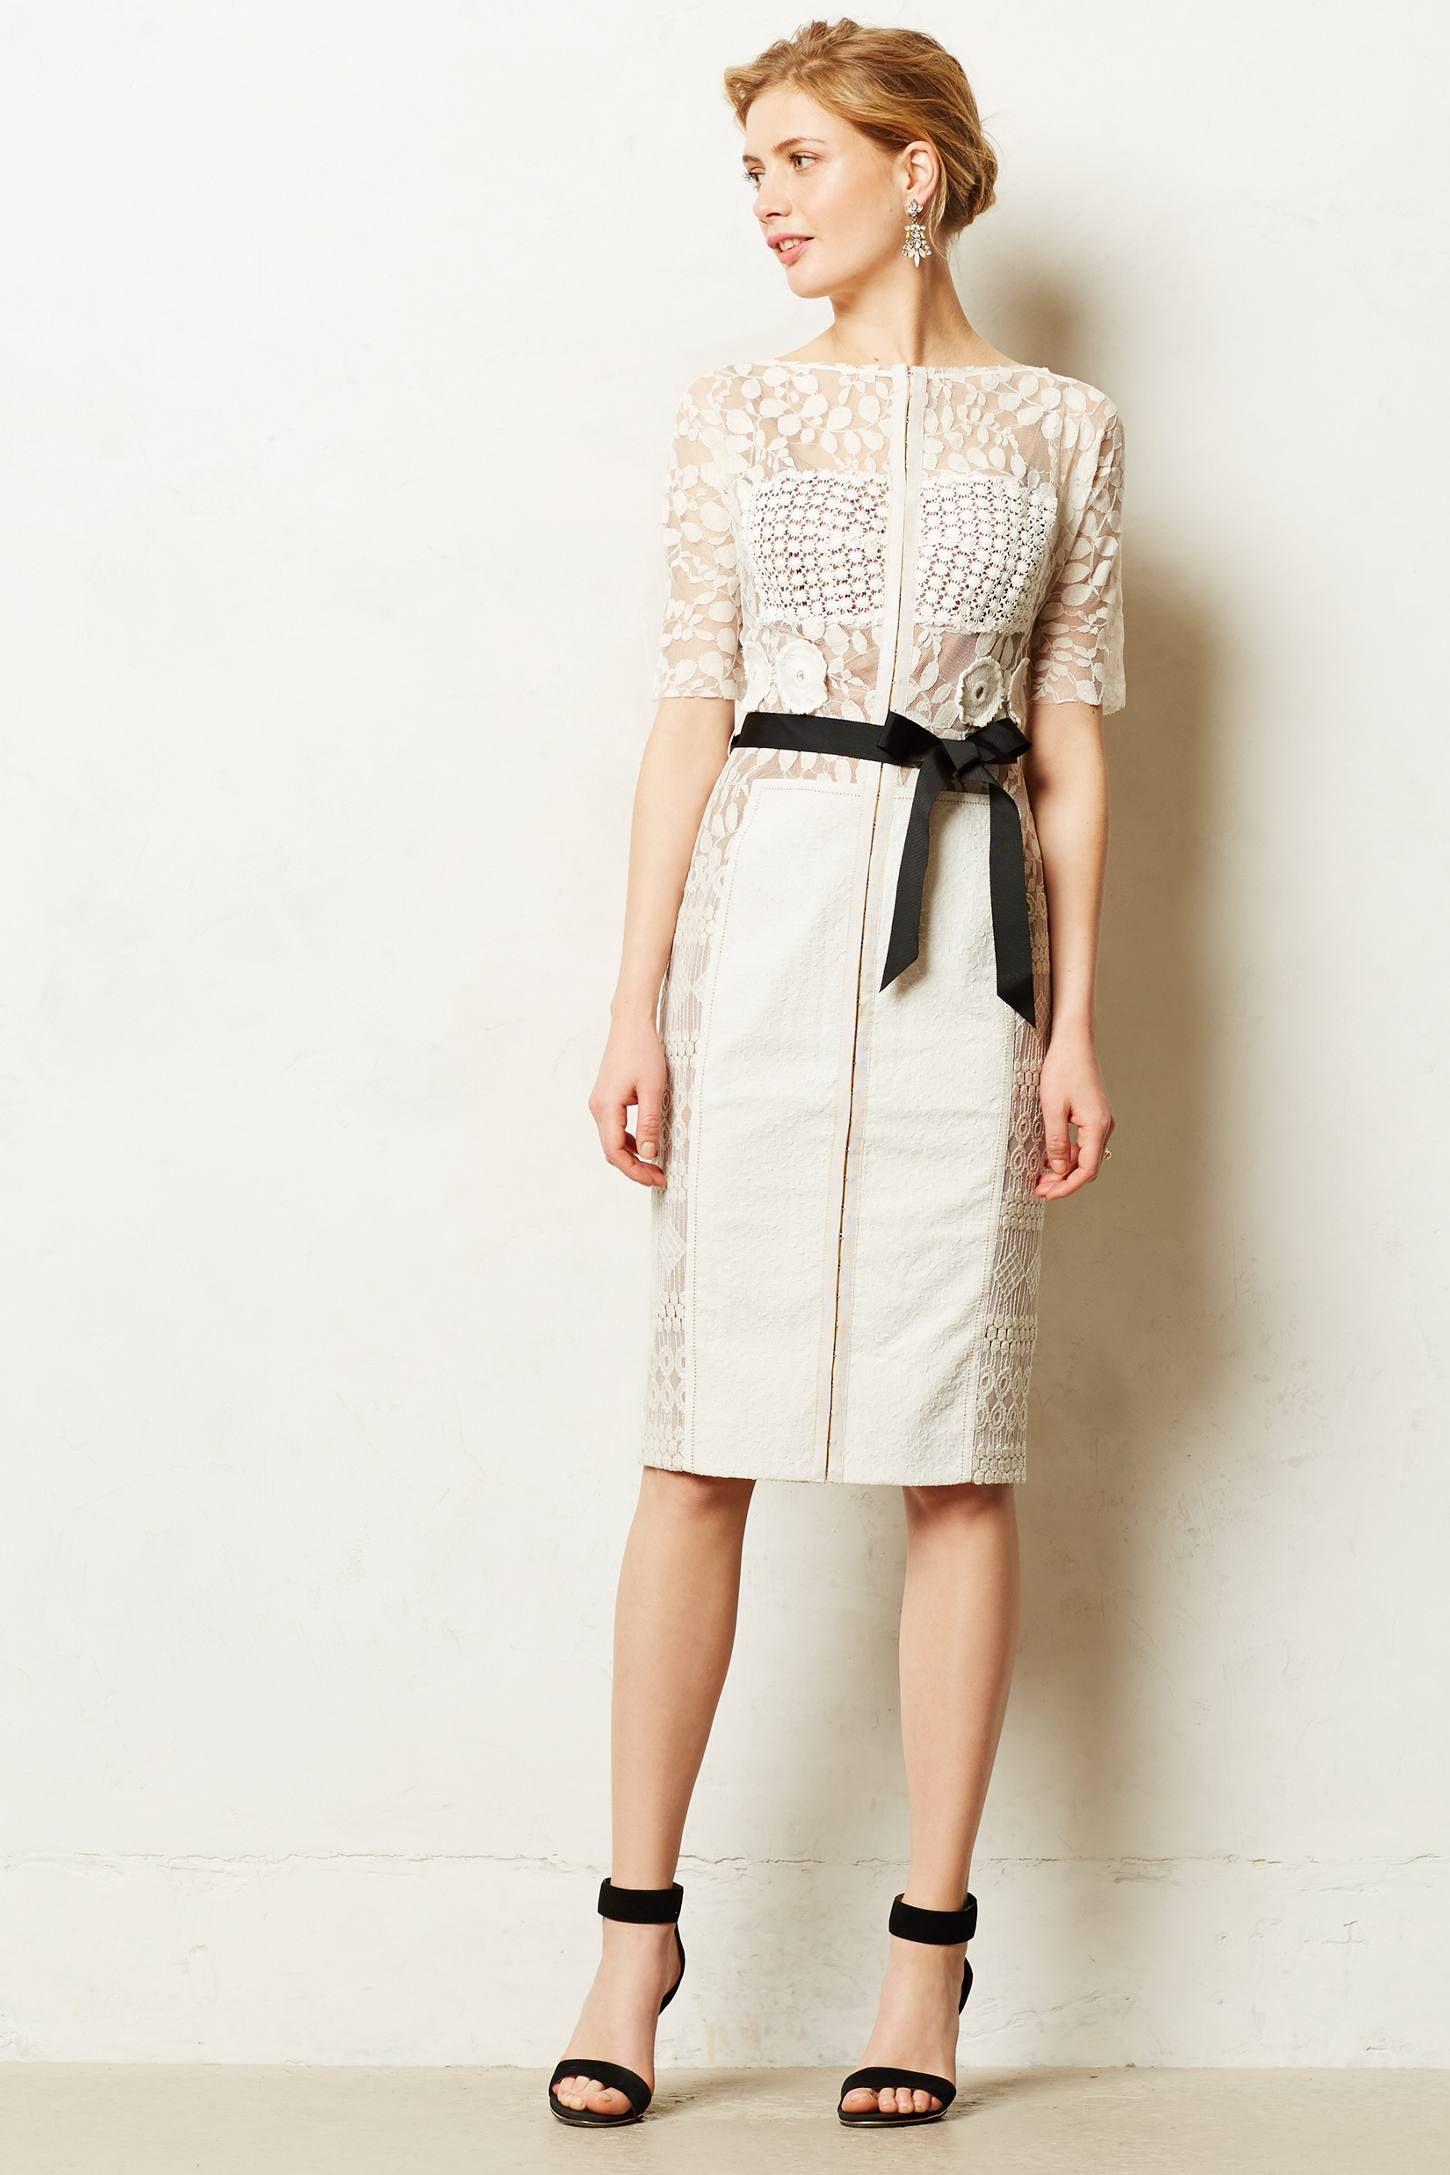 Byron Lars Carissima Sheath Dress Little White Dresses Long Cocktail Dress Dresses